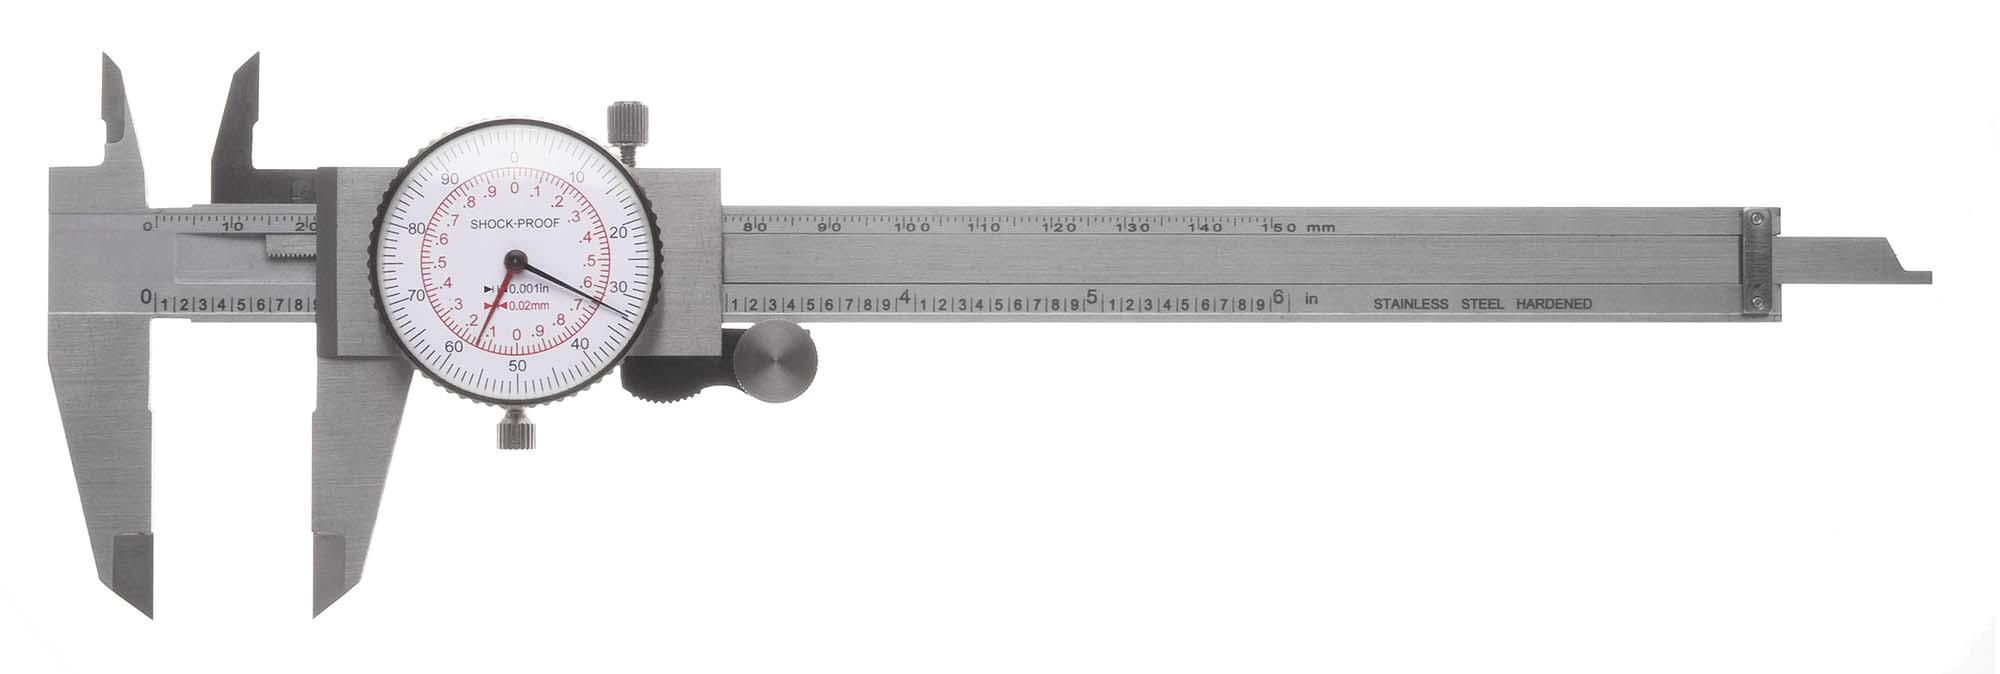 "DCH-6EM  6"" Capacity Inch/MM  Dial Caliper"